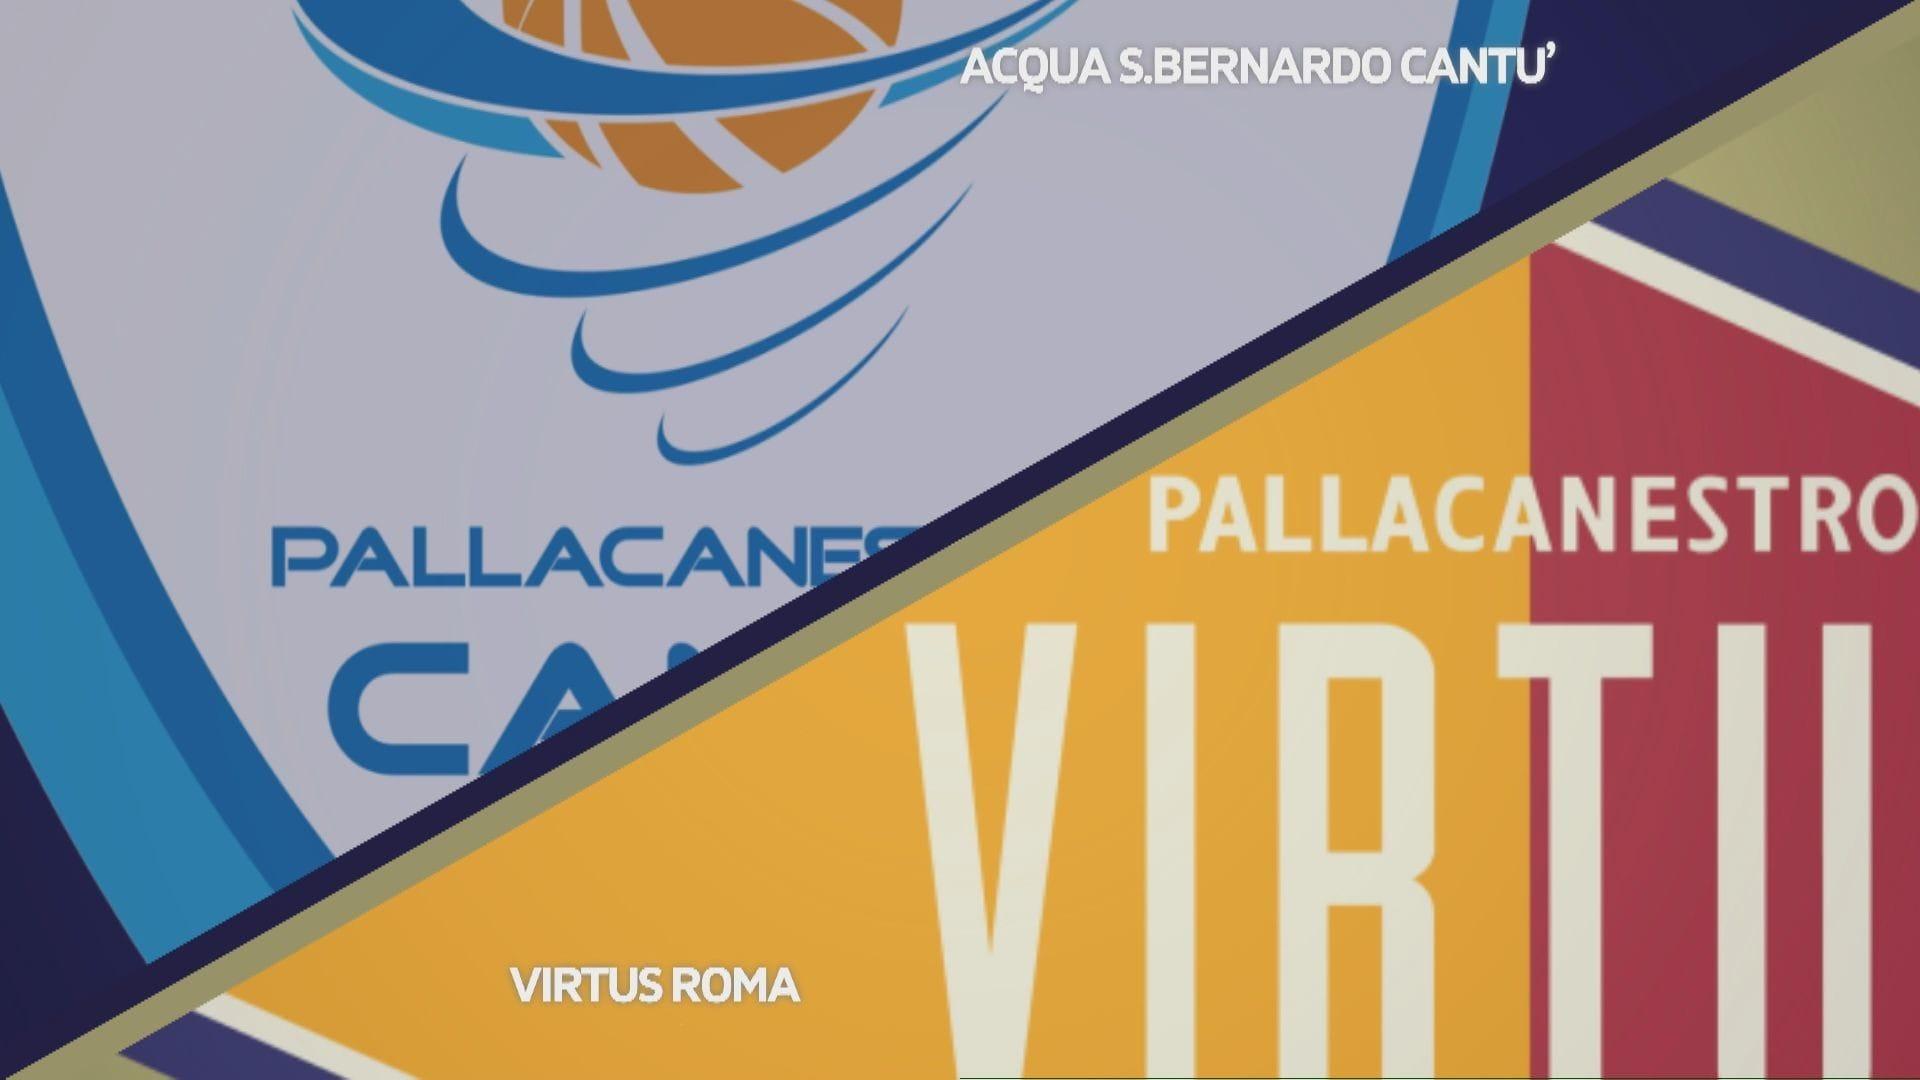 Acqua S. Bernardo Cantù - Virtus Roma 74-76